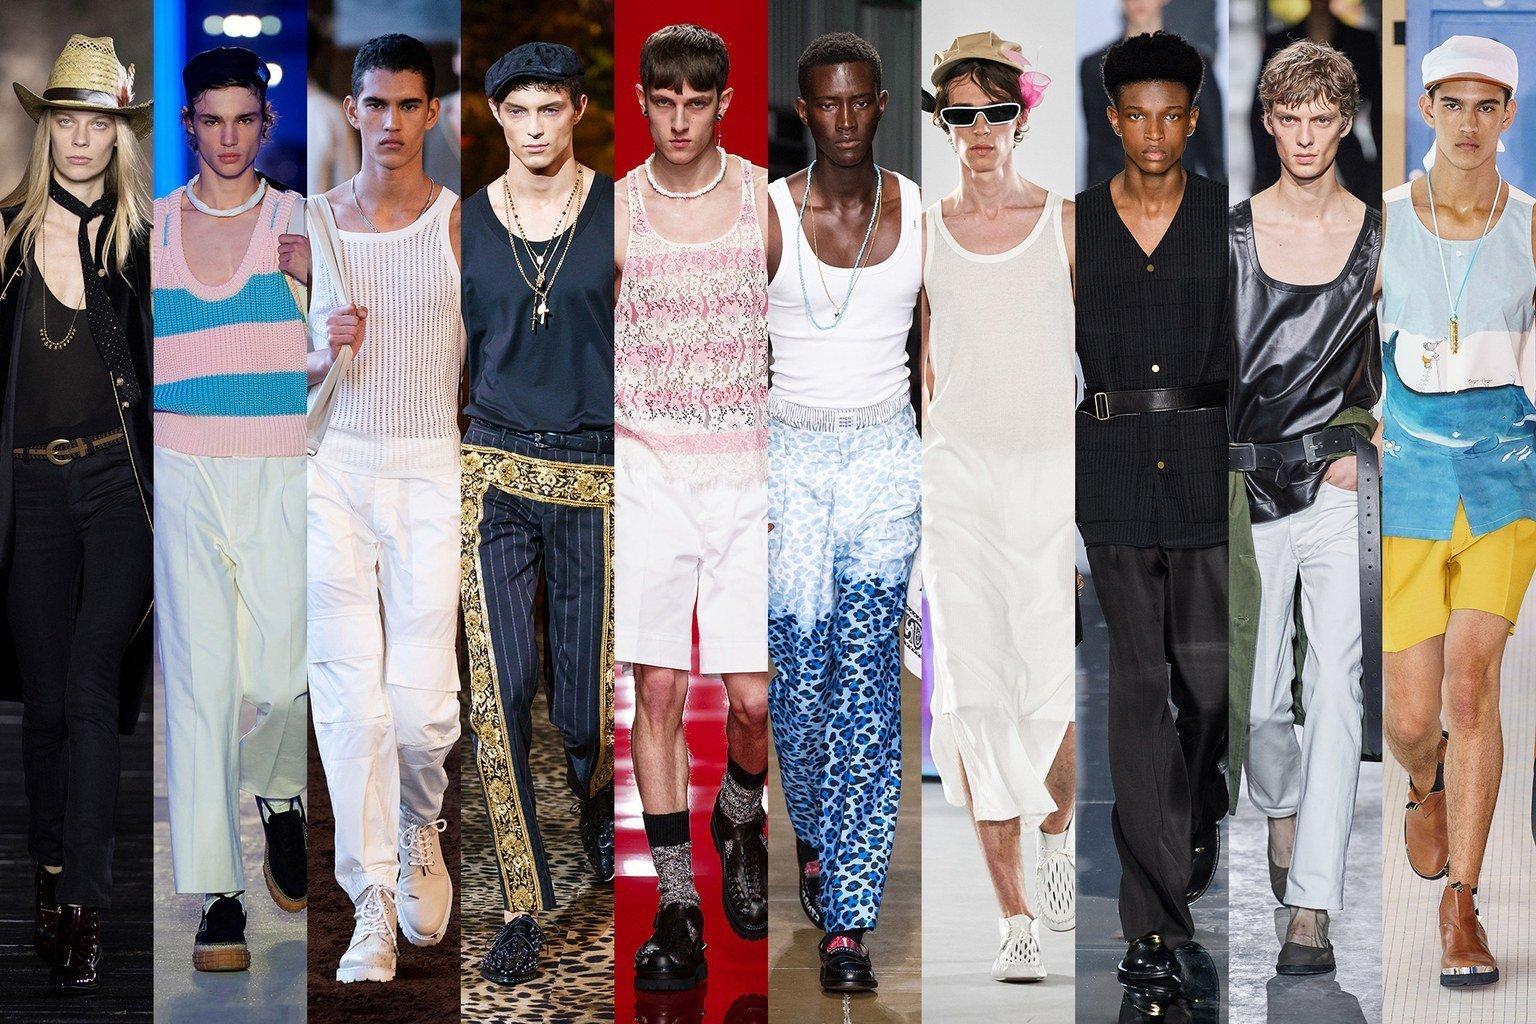 Tendenze Moda Uomo Primavera Estate 2020 - Tendenze Moda Uomo Primavera Estate 2020